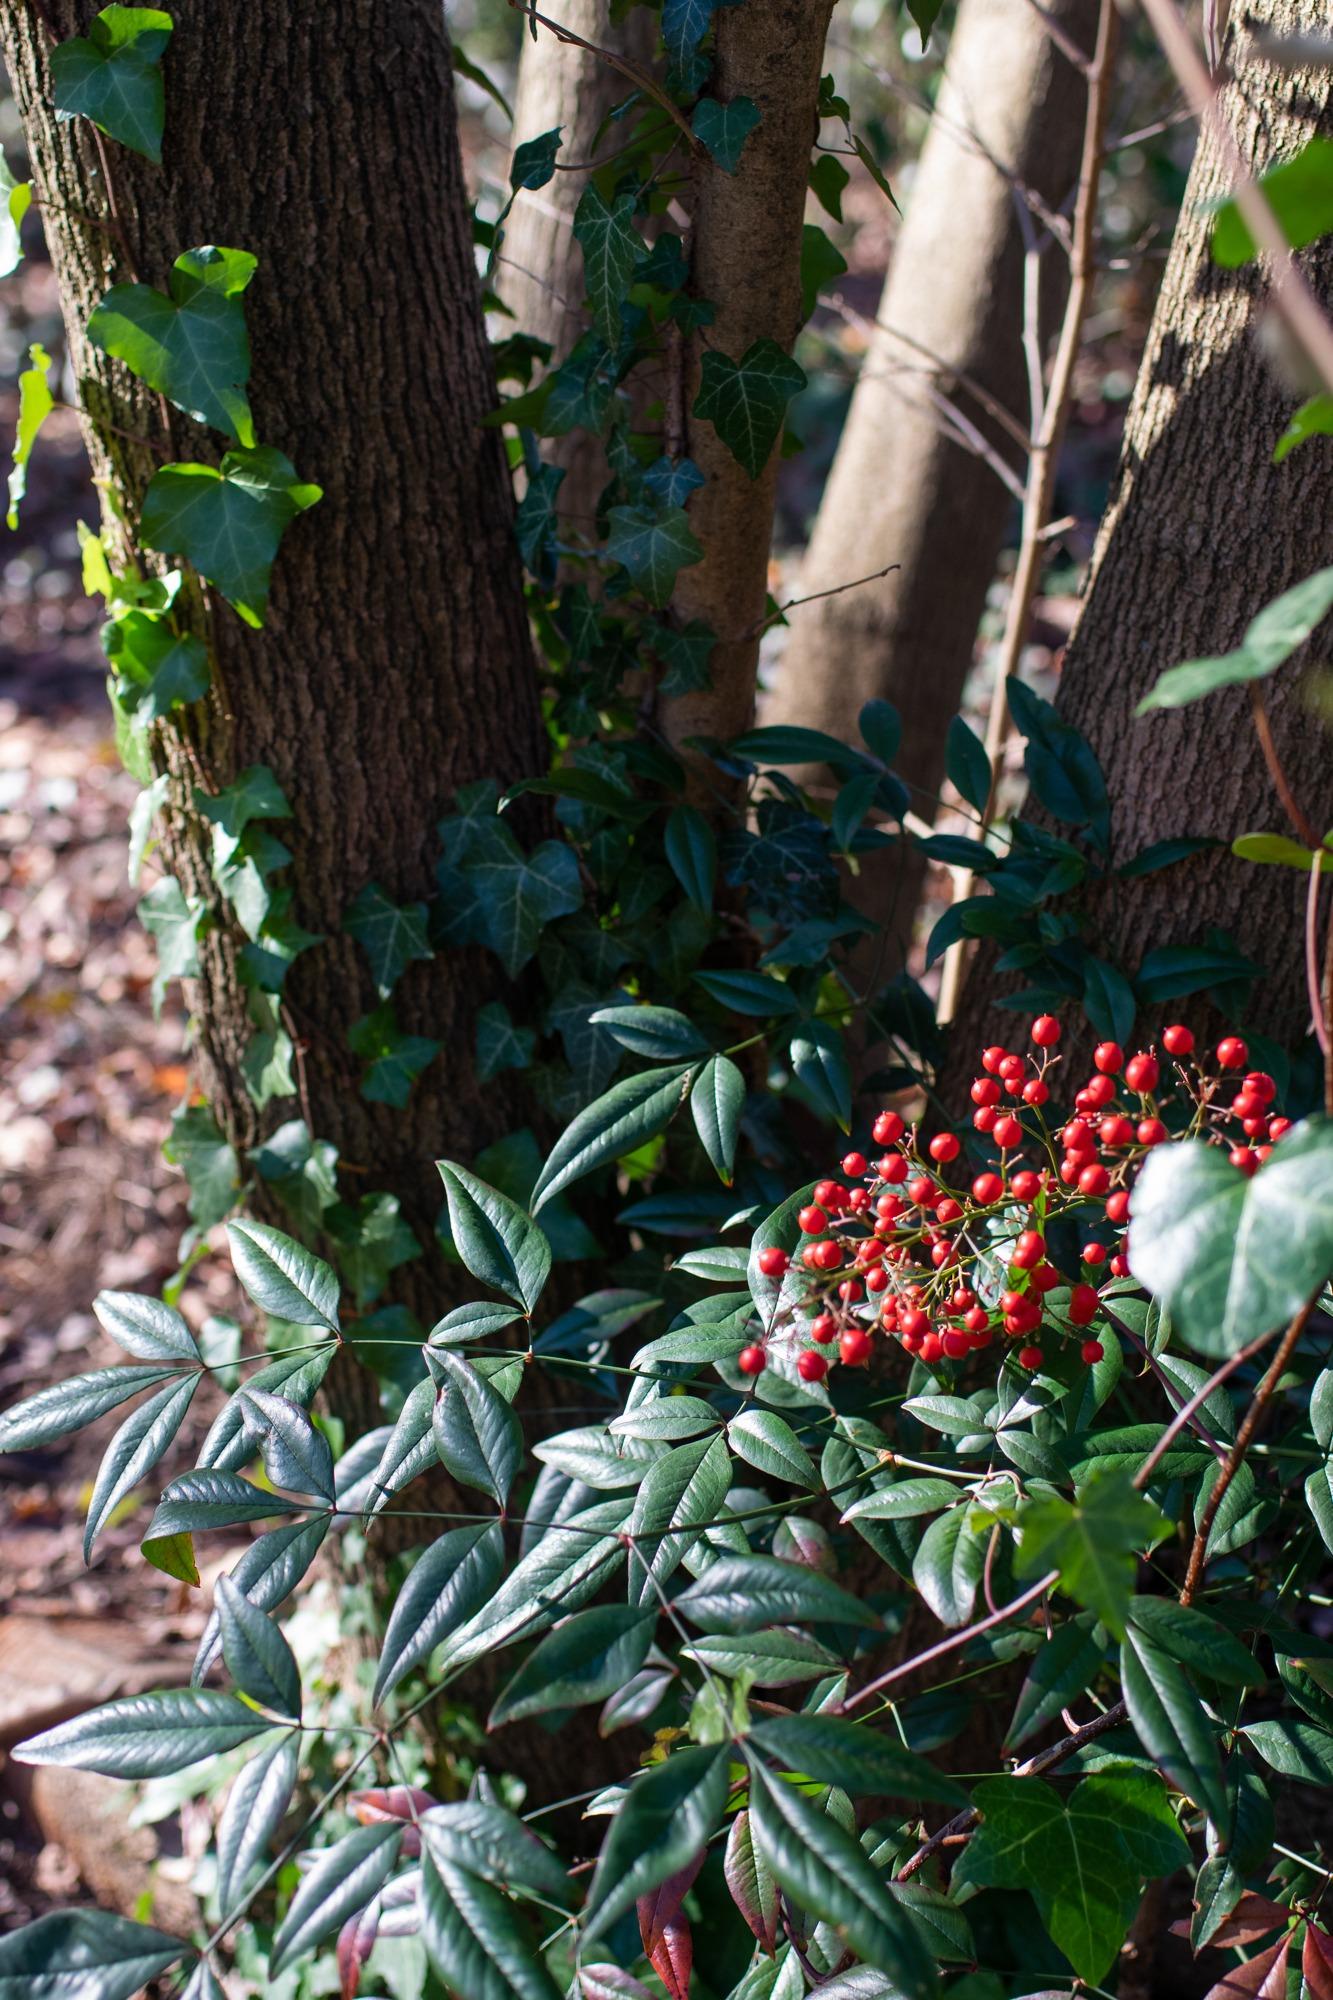 Nandina next to tree with English ivy